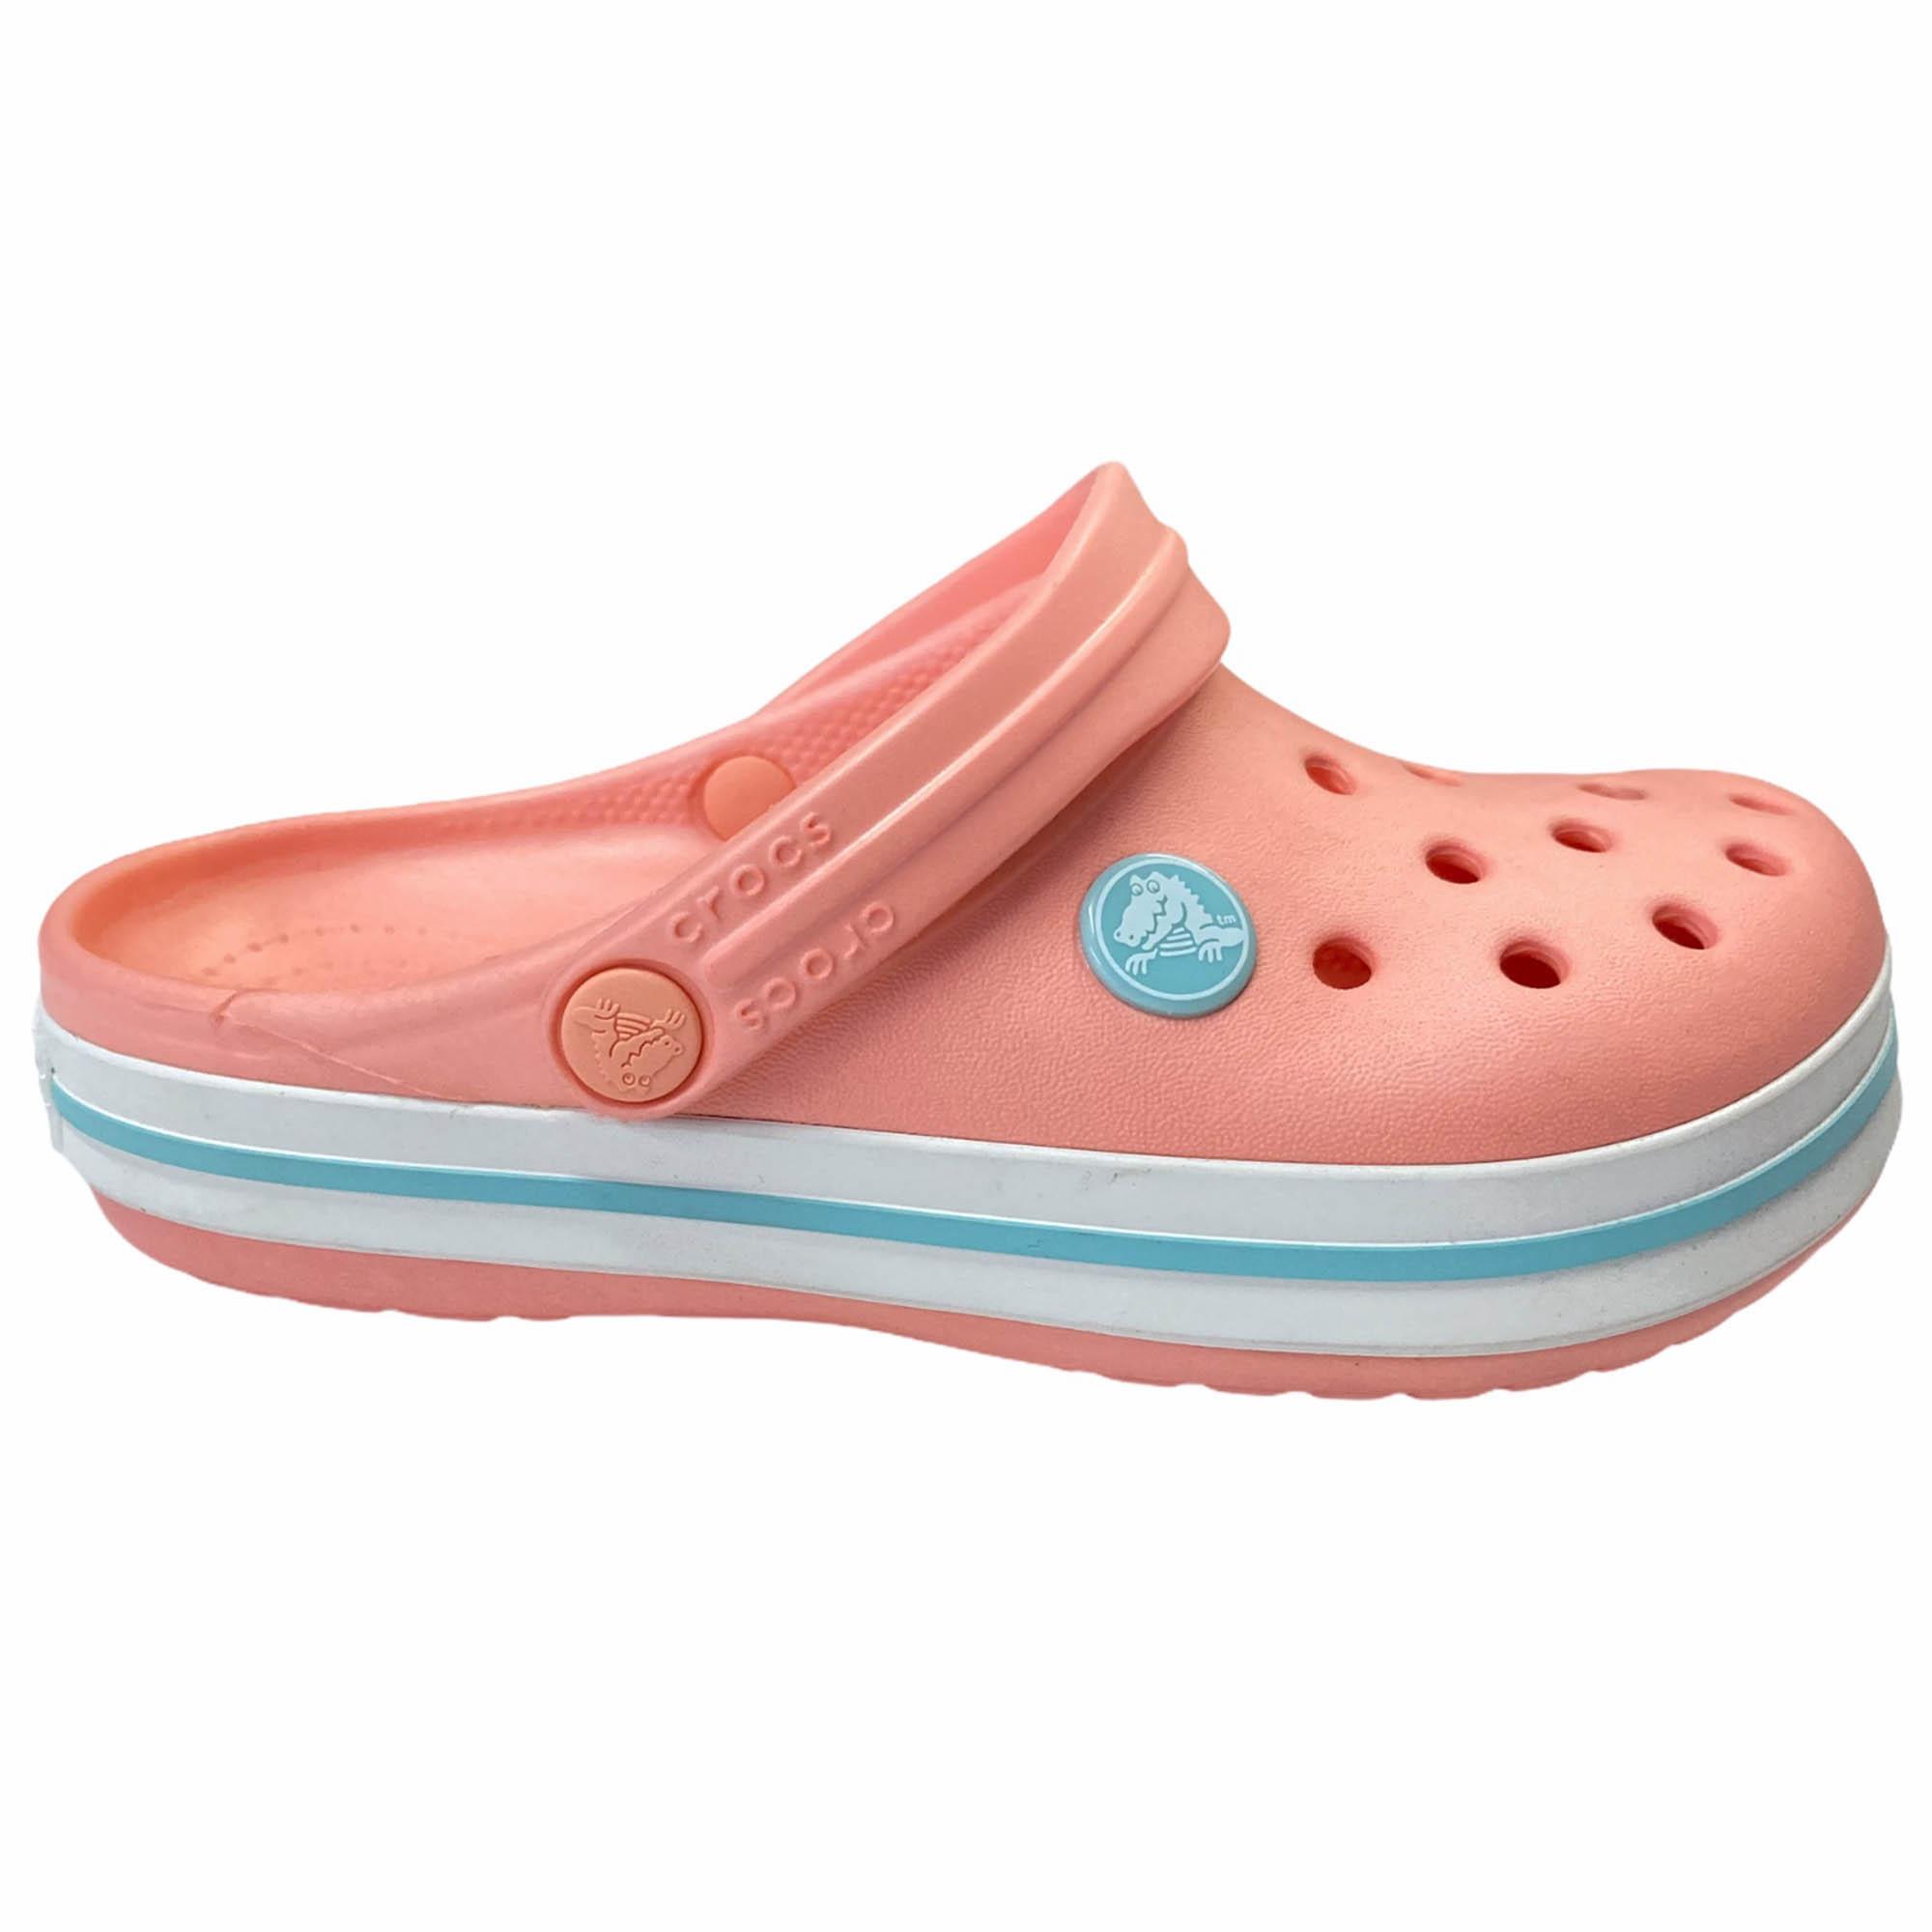 Crocs Crocband K Melon/Ice